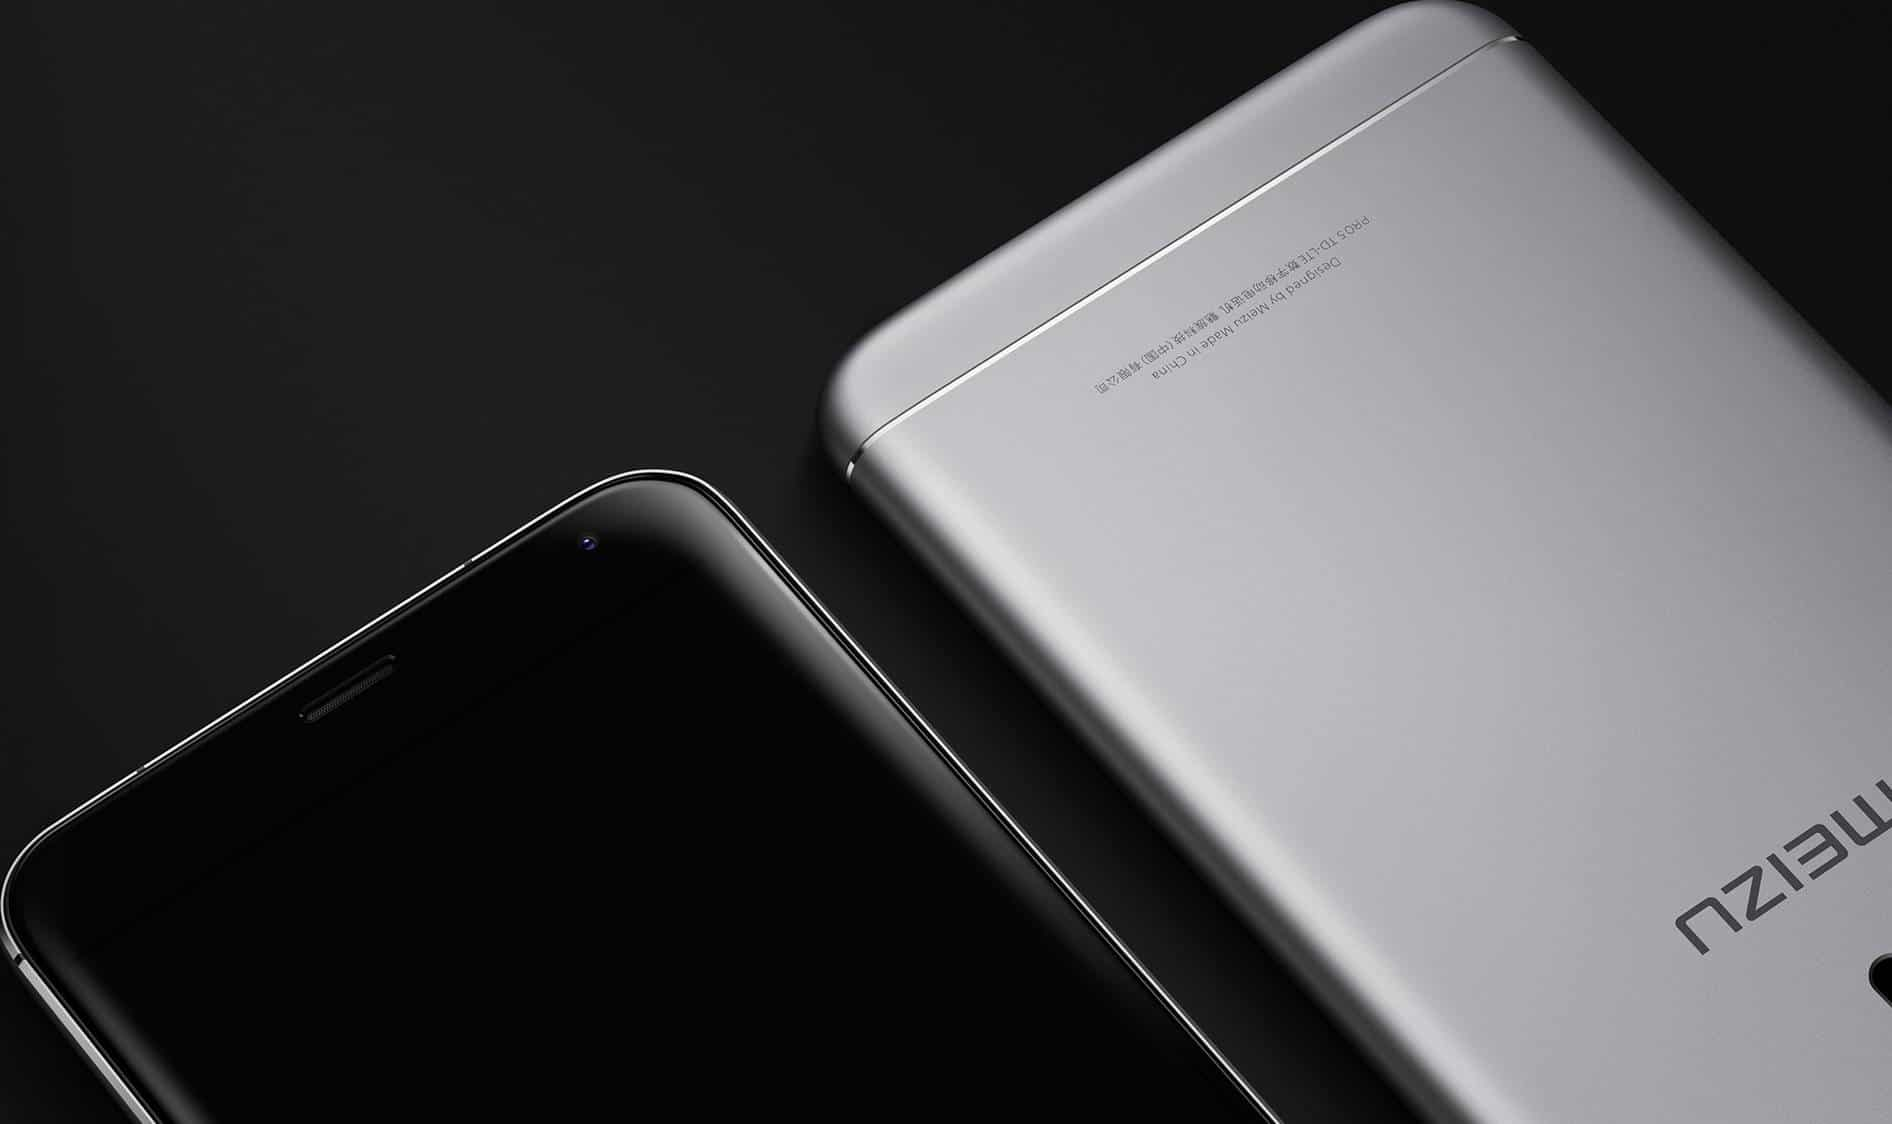 Meizu Pro 5 design